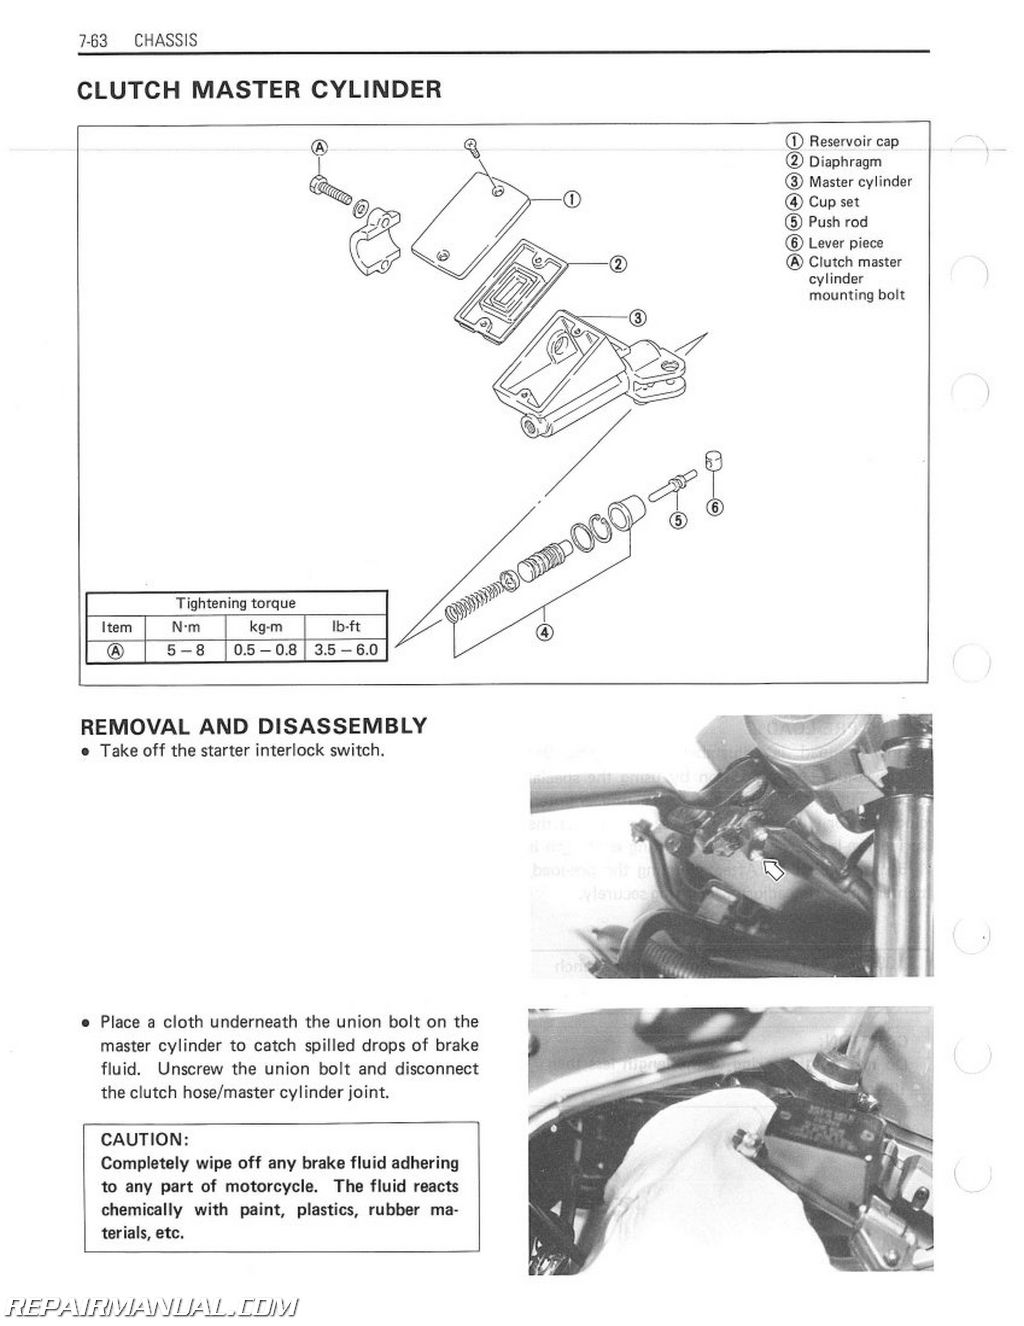 1986 1990 suzuki gsxr750 motorcycle service manual rh repairmanual com 1990 rm125 service manual 1990 miata service manual pdf